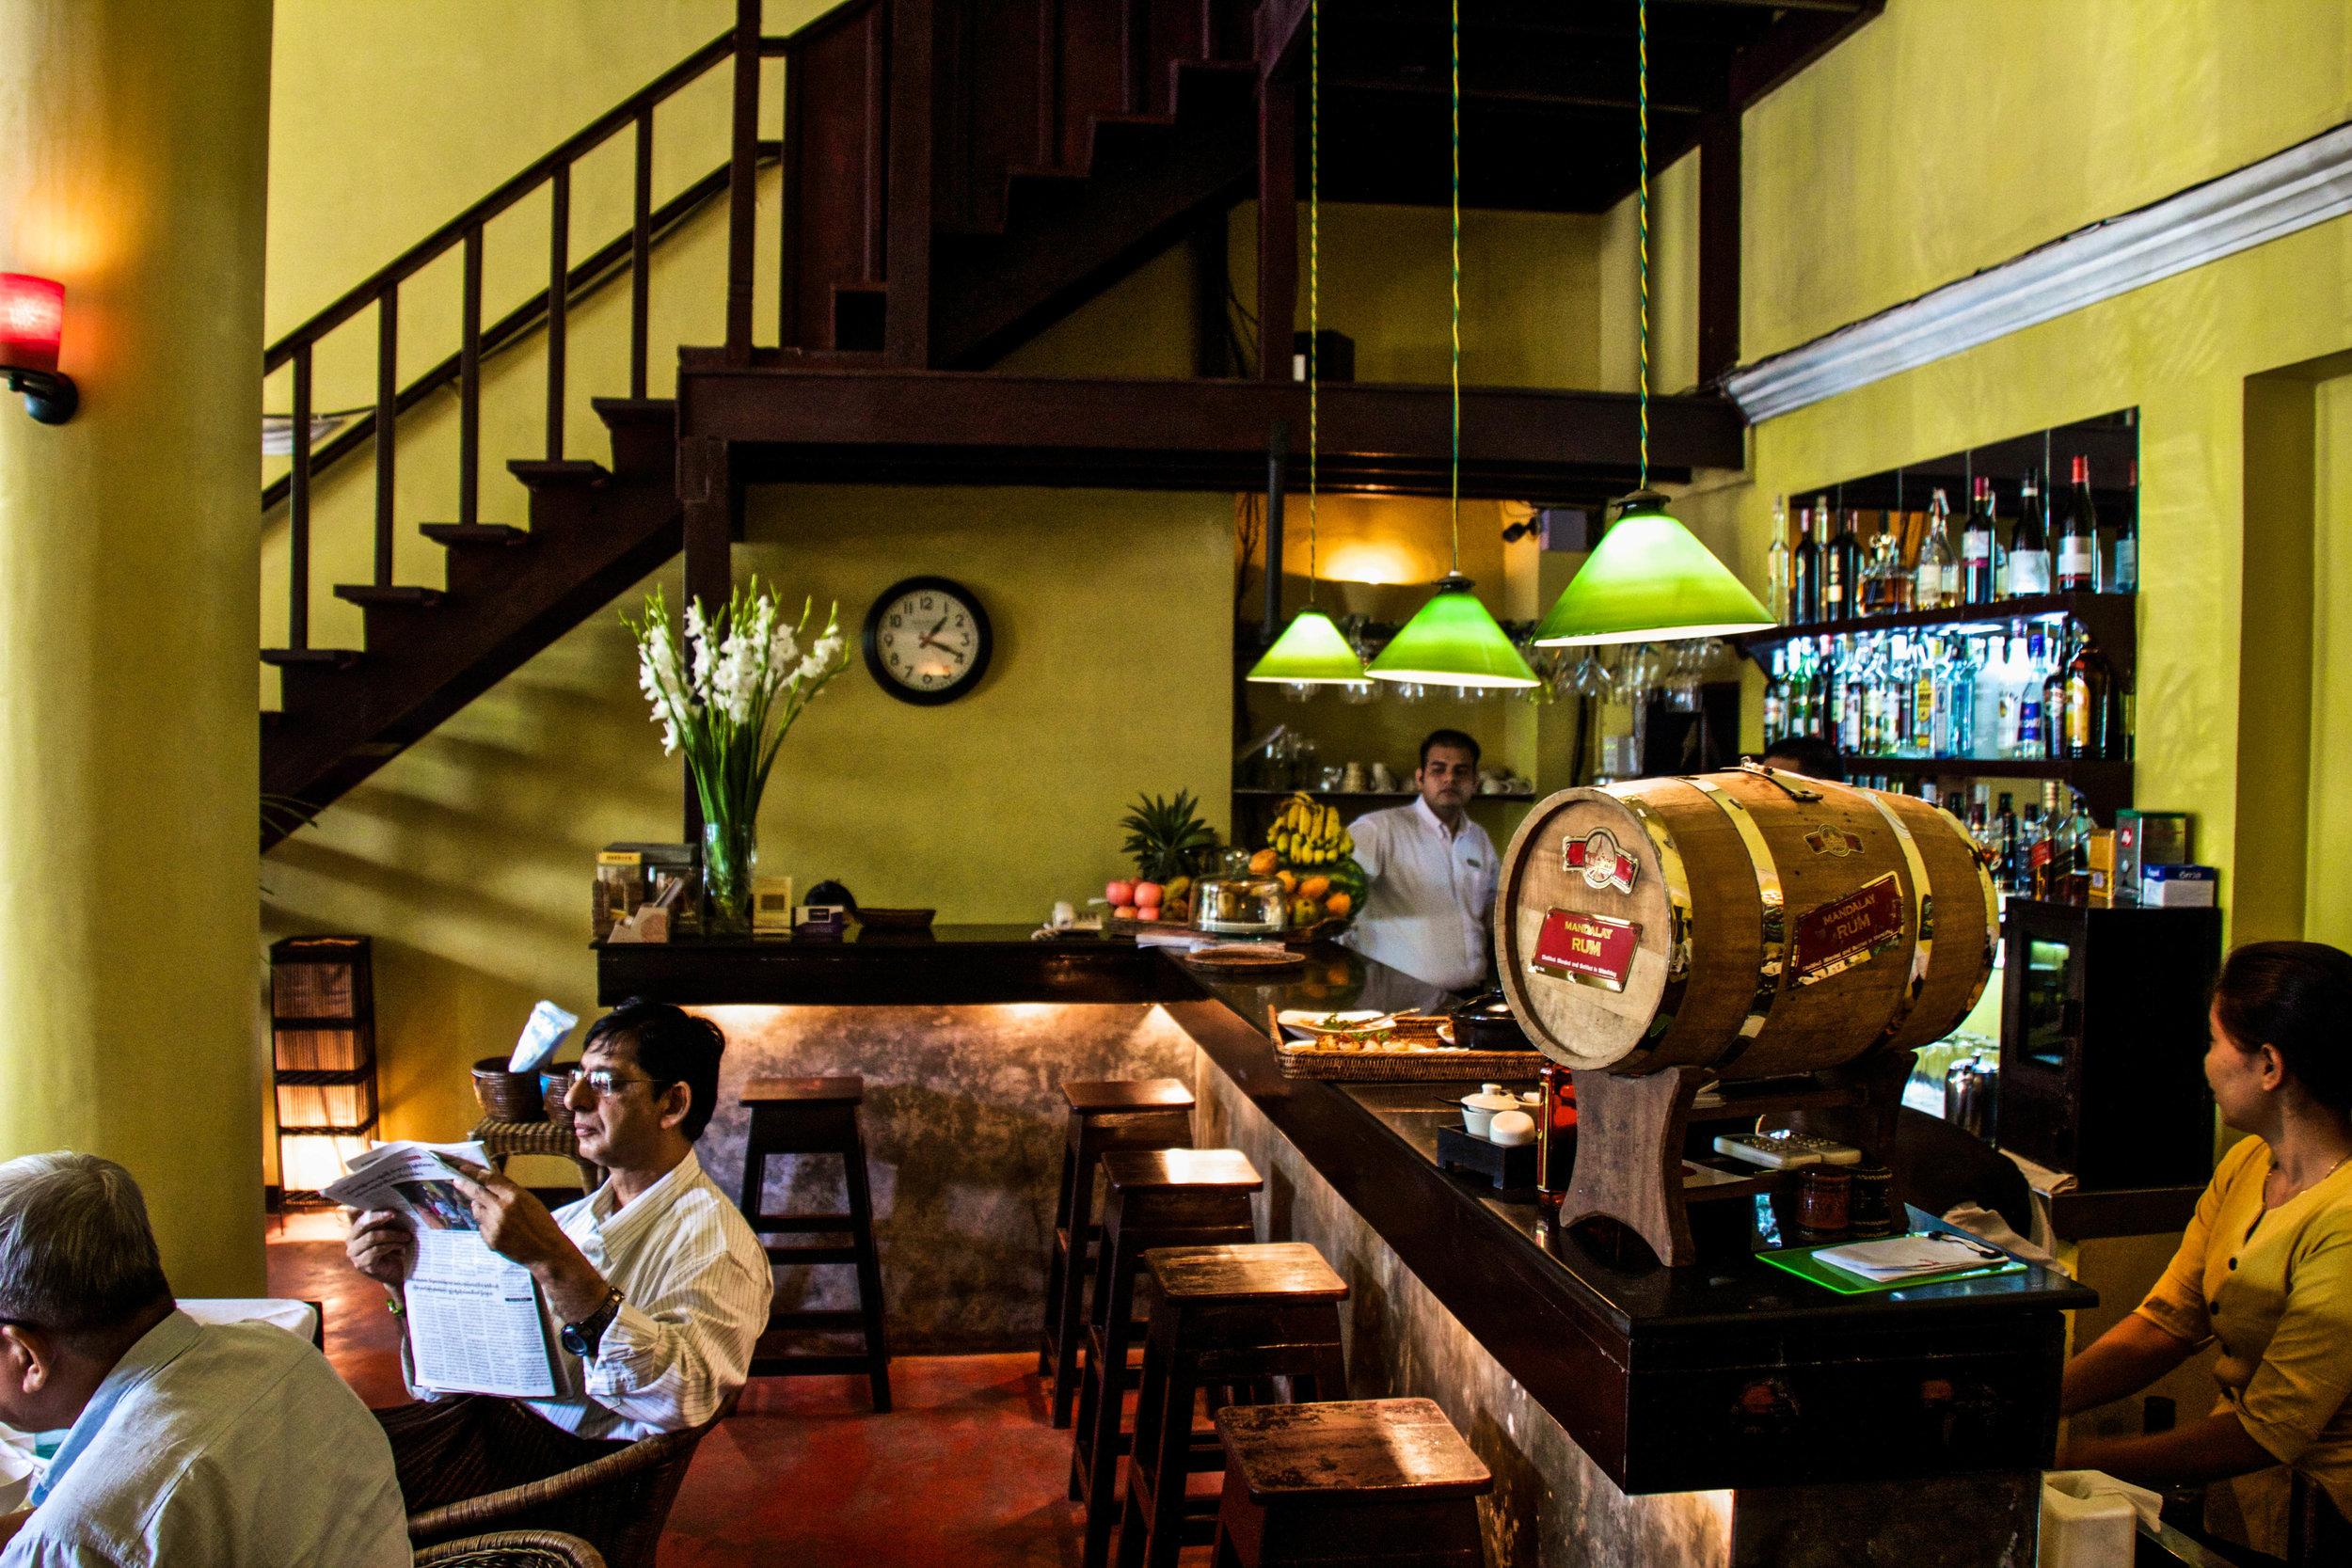 monsoon restaurant rangoon yangon burma myanmar 1-2.jpg